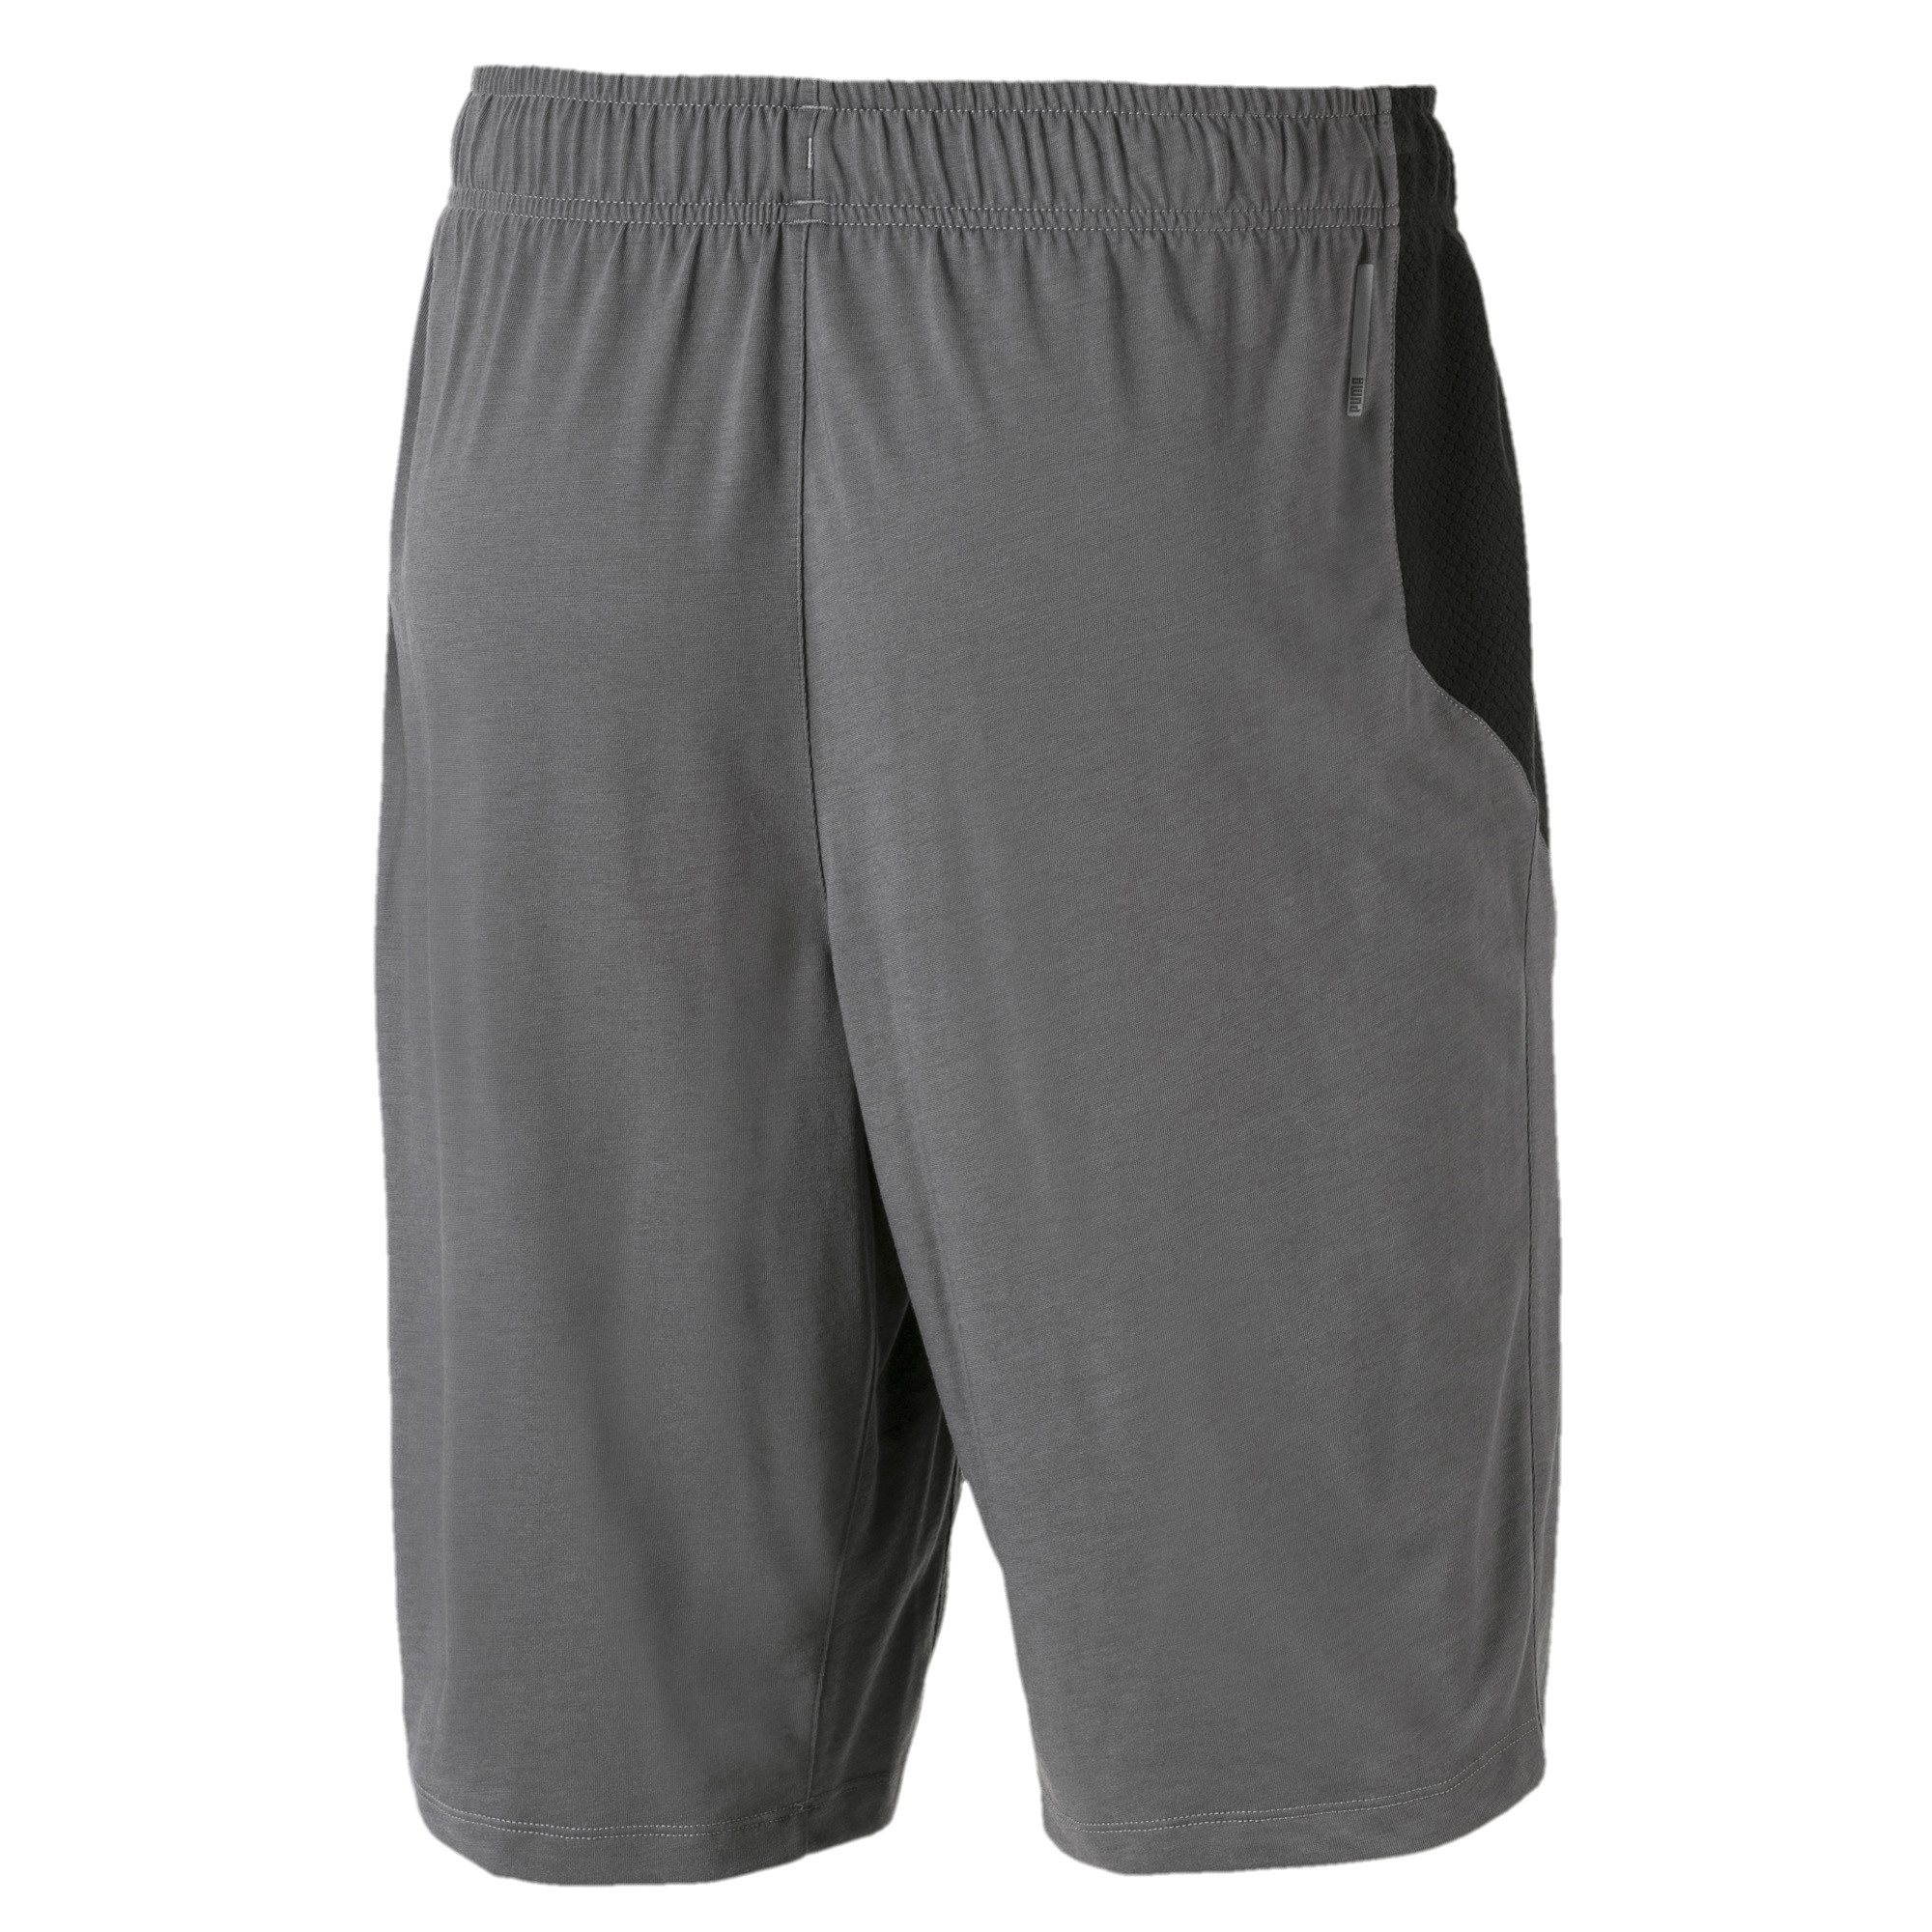 PUMA-Reactive-Drirelease-Men-039-s-Shorts-Men-Knitted-Shorts-Training thumbnail 3